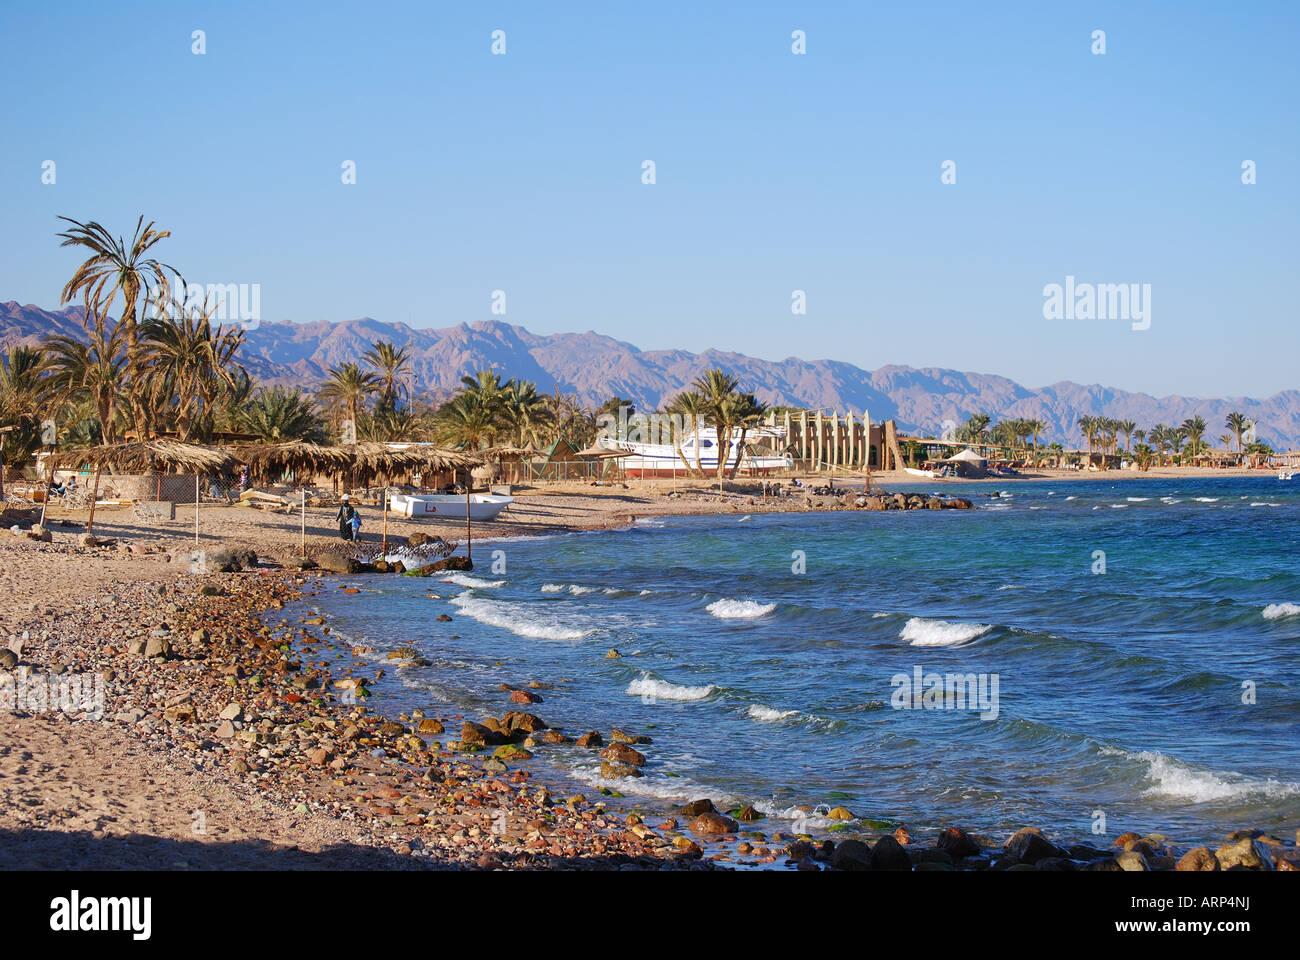 Nuweiba beach, Nuweiba, Sinai Peninsula, Republic of Egypt Stock Photo